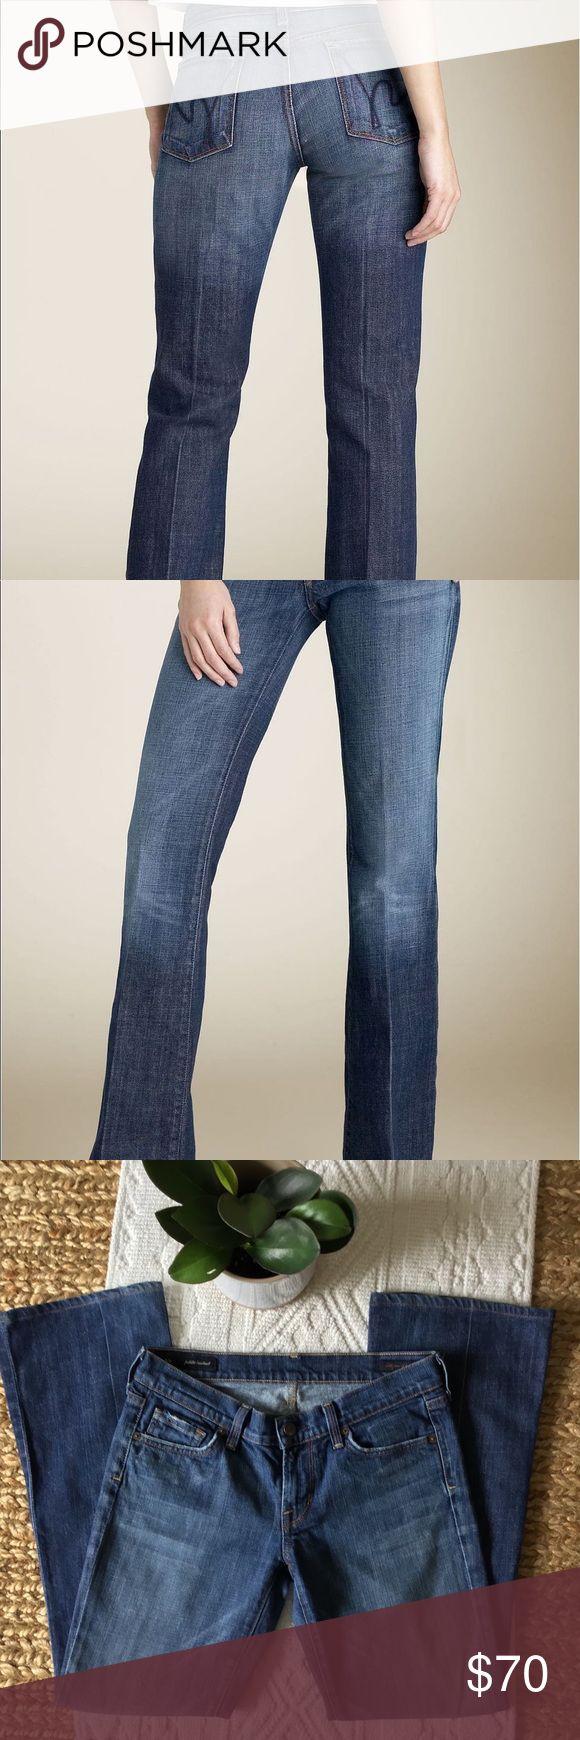 Anne klein petite bootcut jeans #12